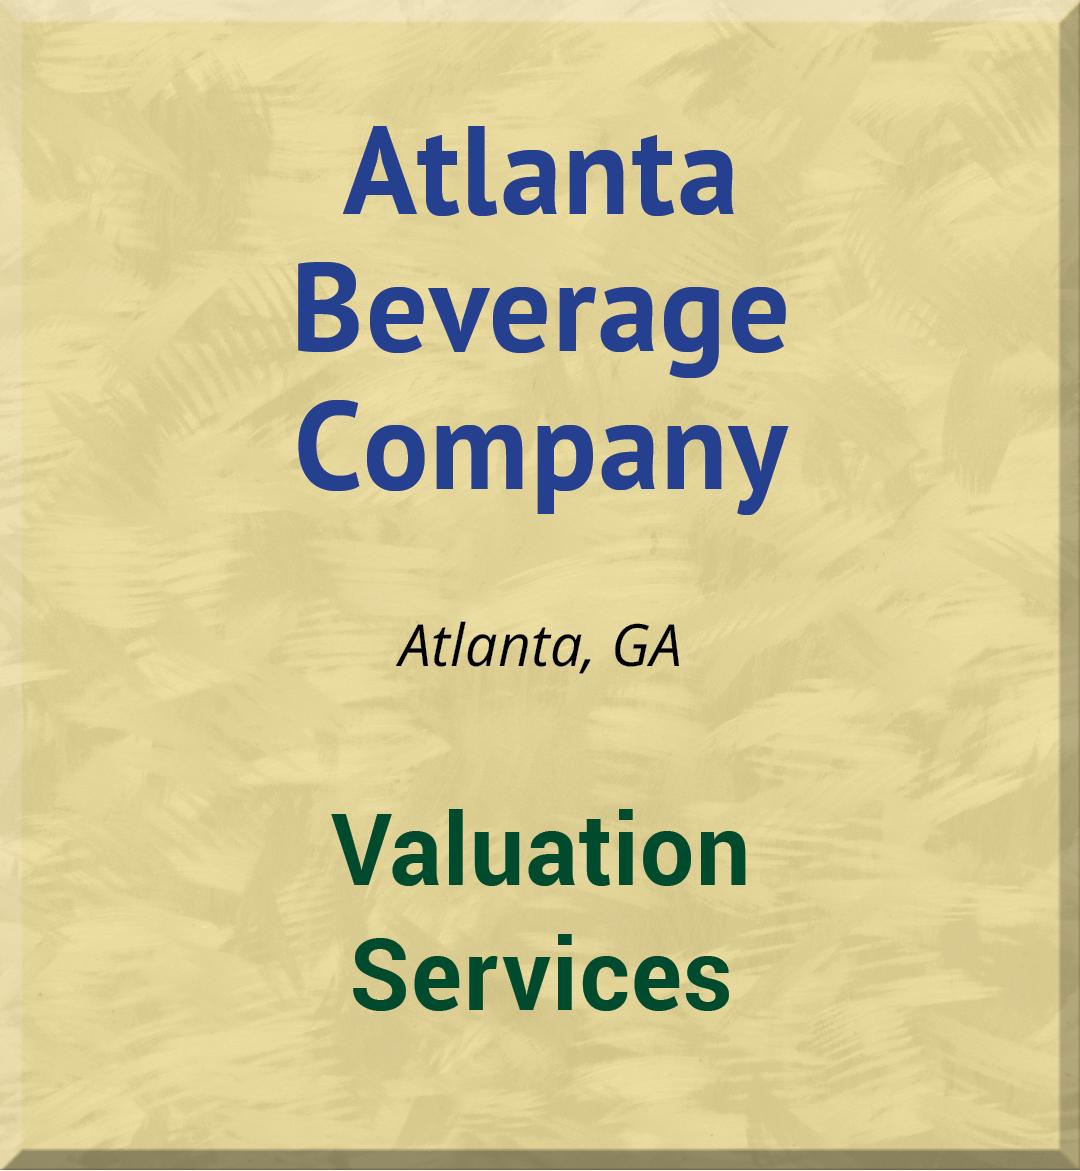 Atlanta Beverage Company